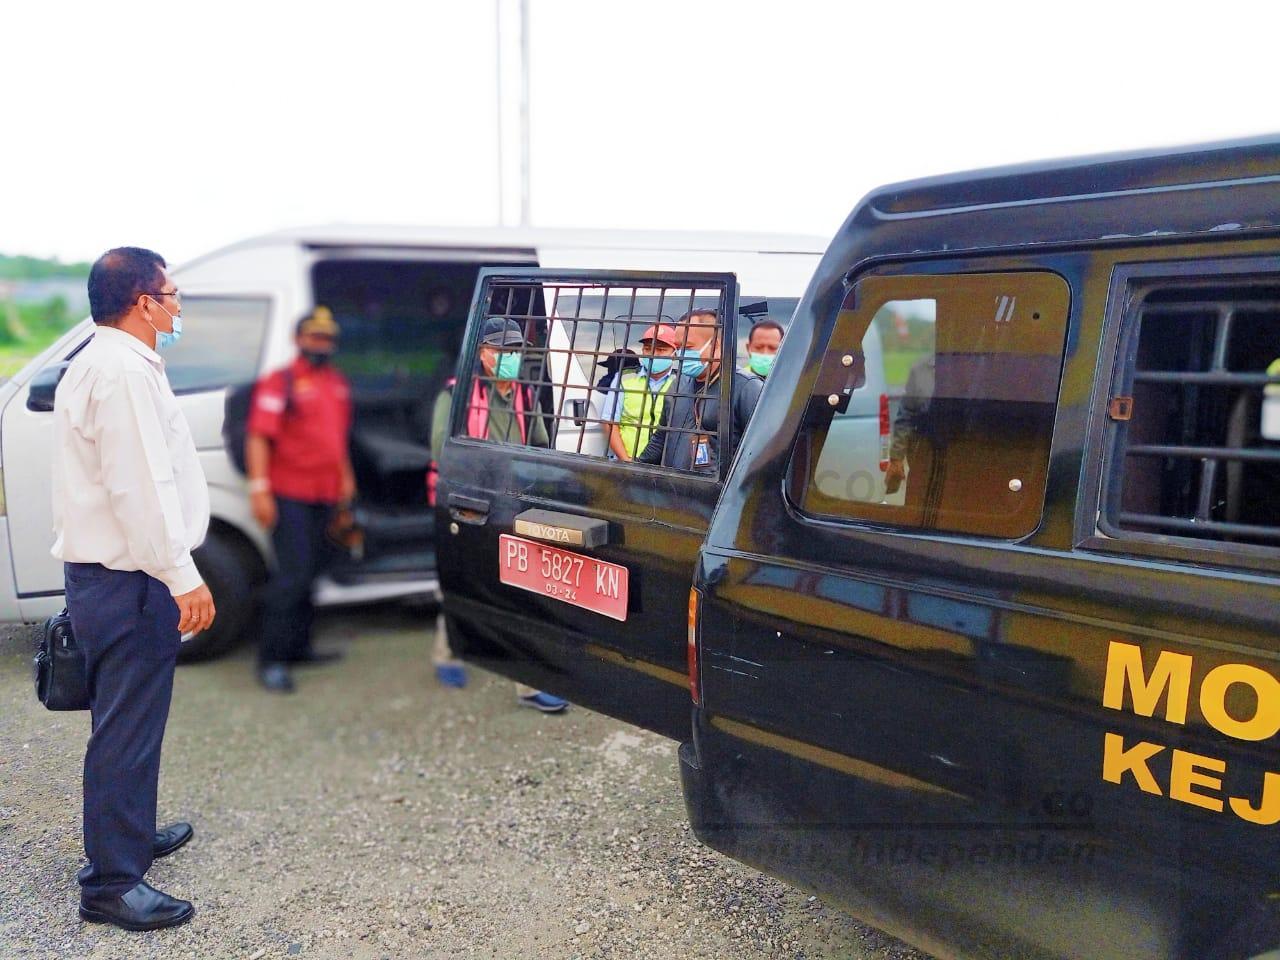 Kabur ke Jakarta, Terpidana Kasus Amdal Teluk Wondama Ini Ditangkap di Cilincing 1 IMG 20201214 WA0035